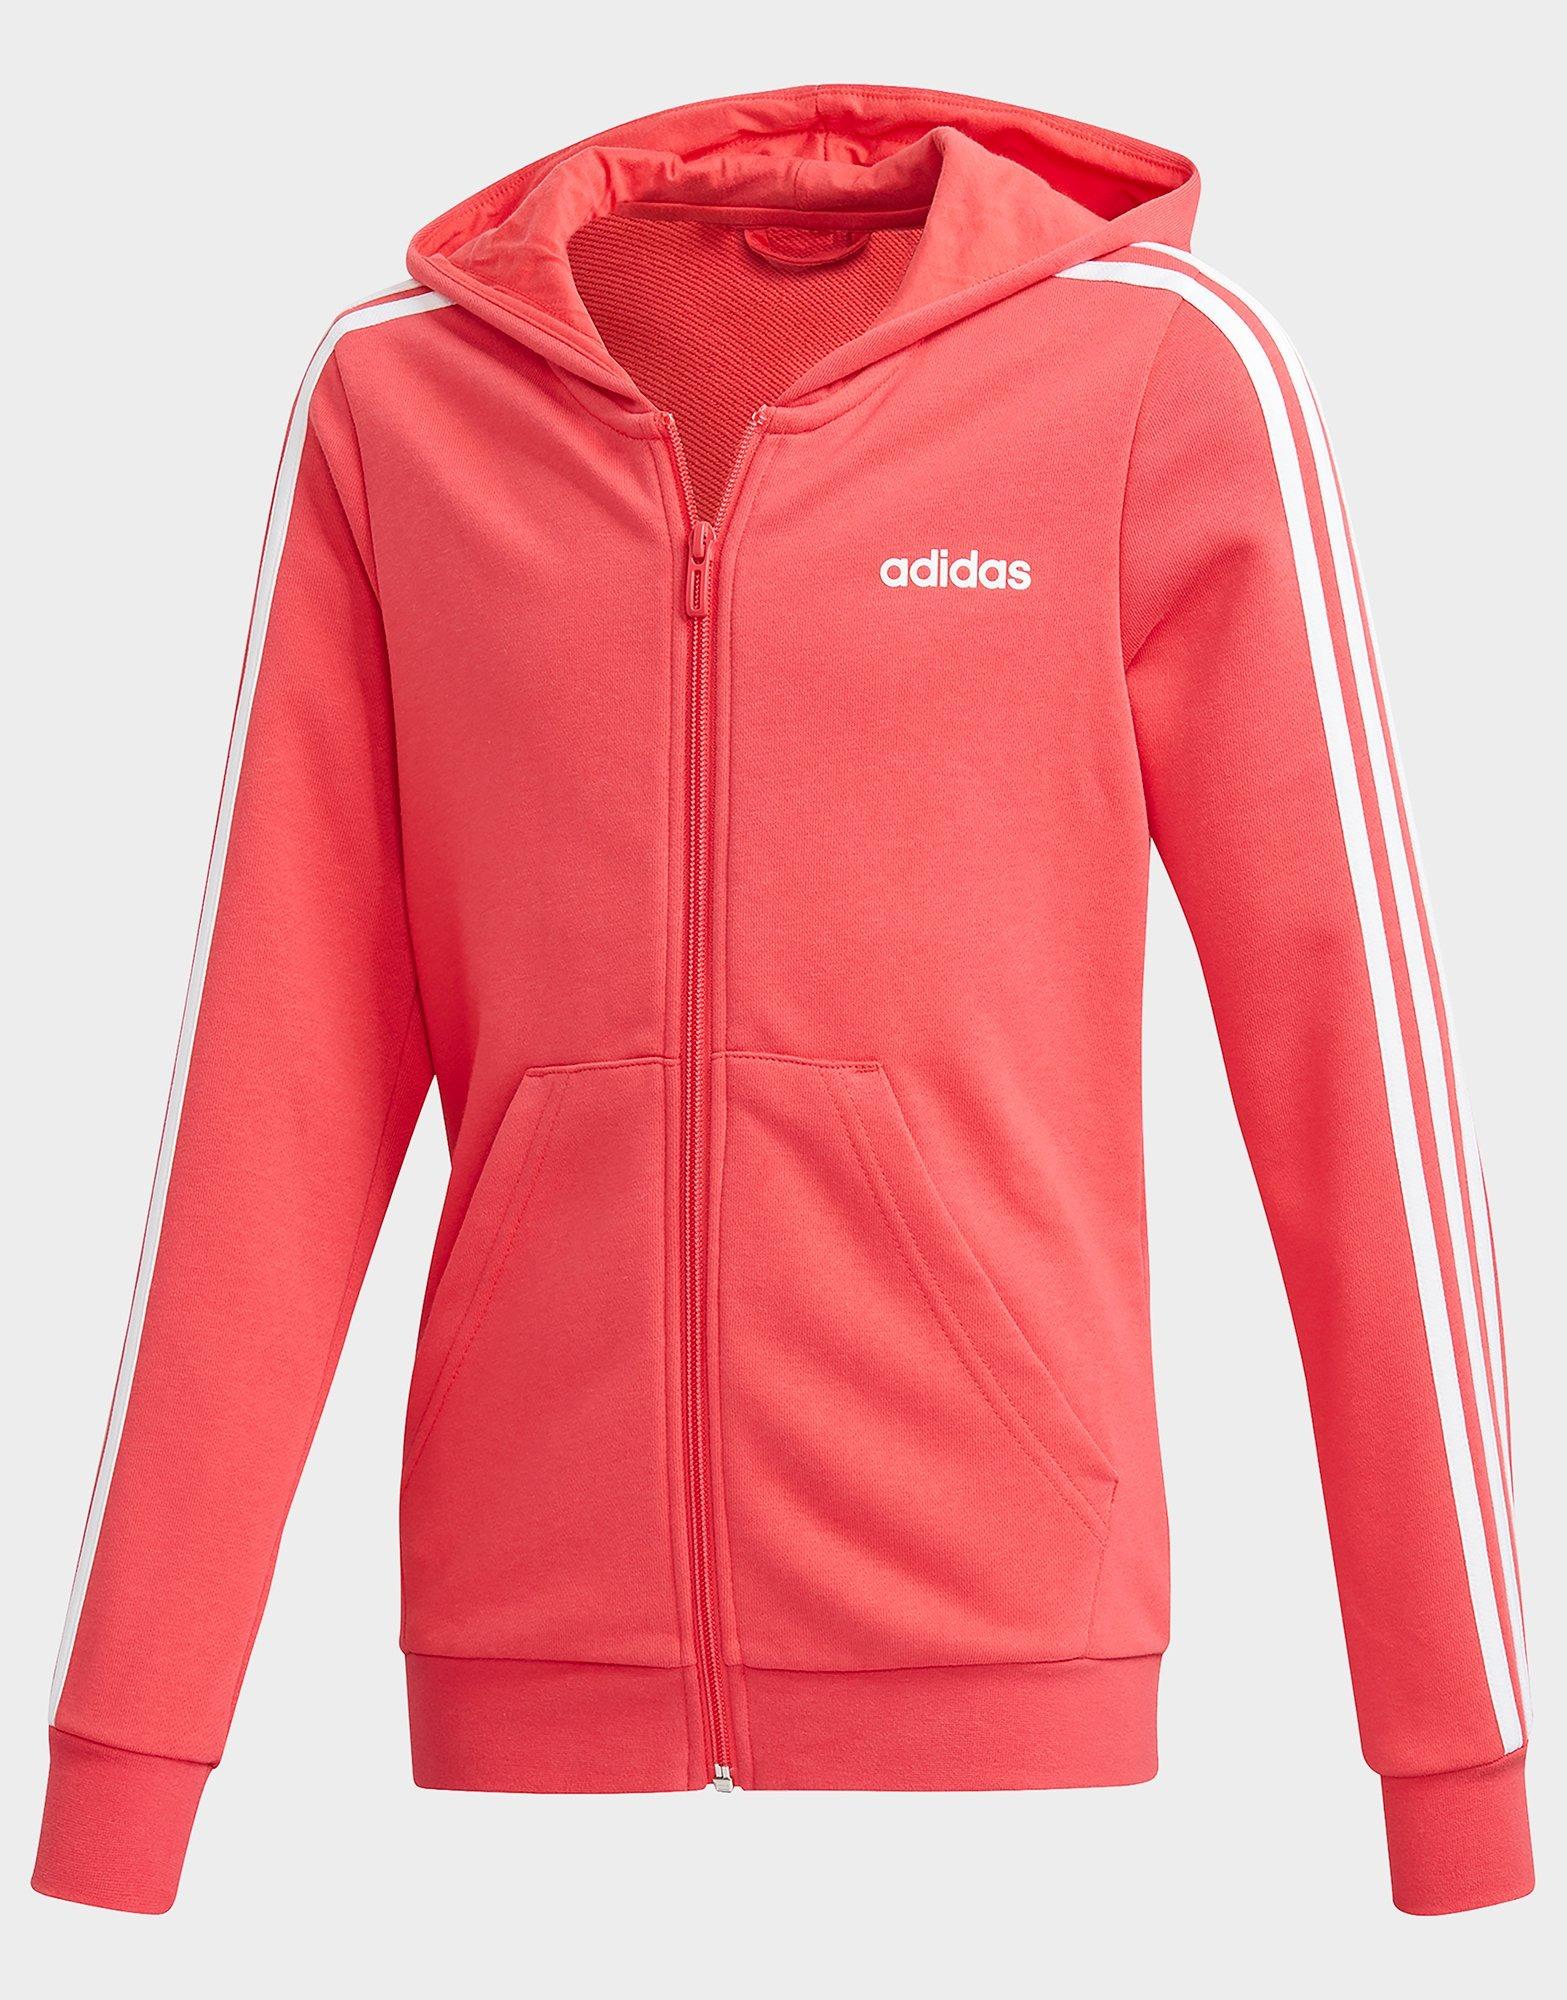 Adidas clothing mens adidas Essentials 3 Stripes Hoodie